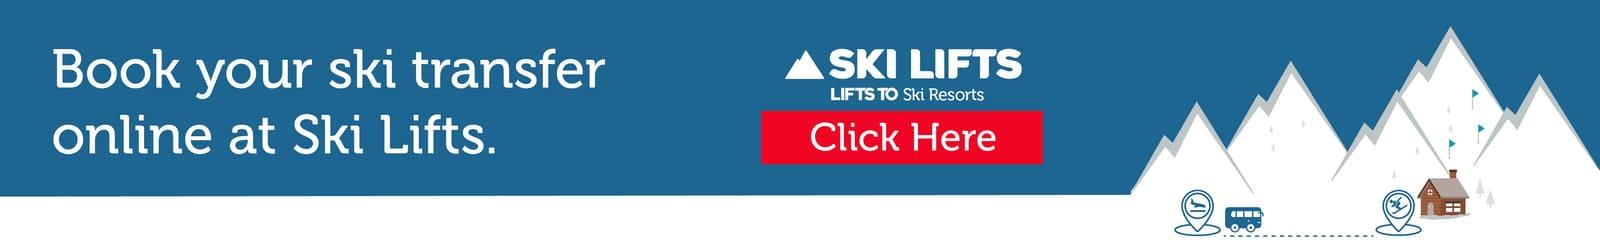 Book your ski transfer at Ski-Lifts